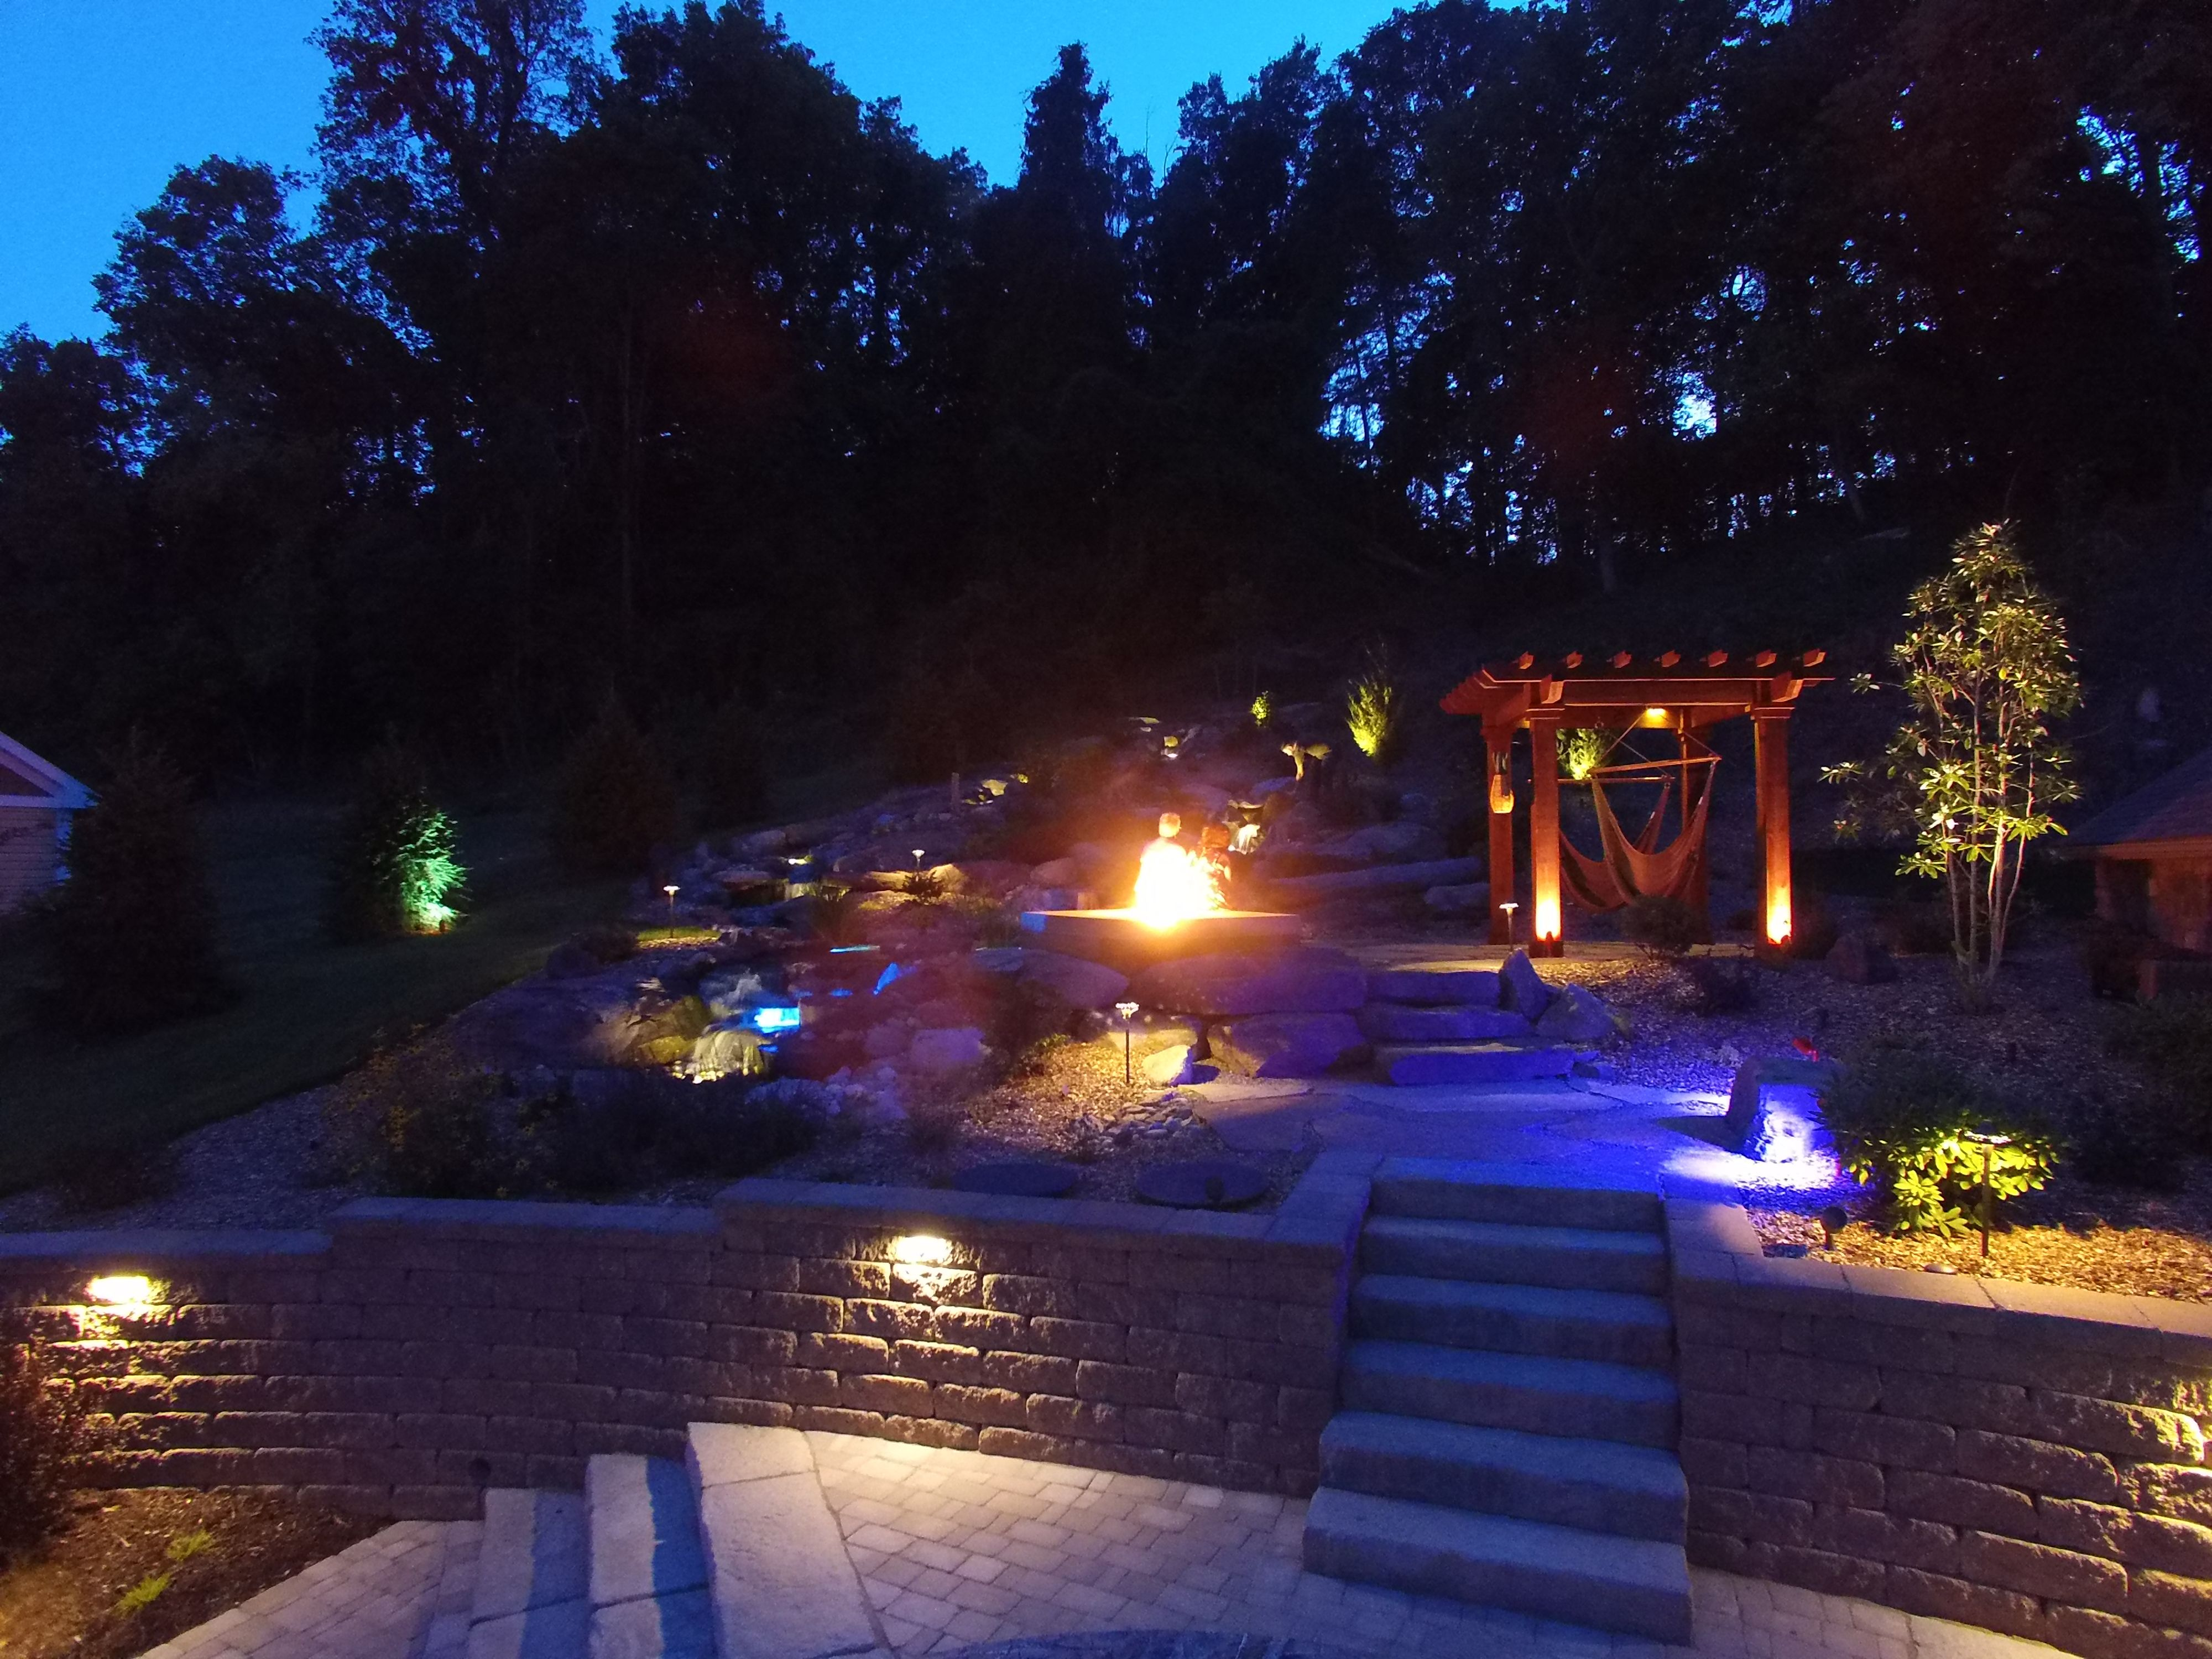 paradise landscape lighting. Paradise Outdoor Lighting. Ultimate Living \\u0026 Entertaining Backyard At Night! Lighting Landscape G